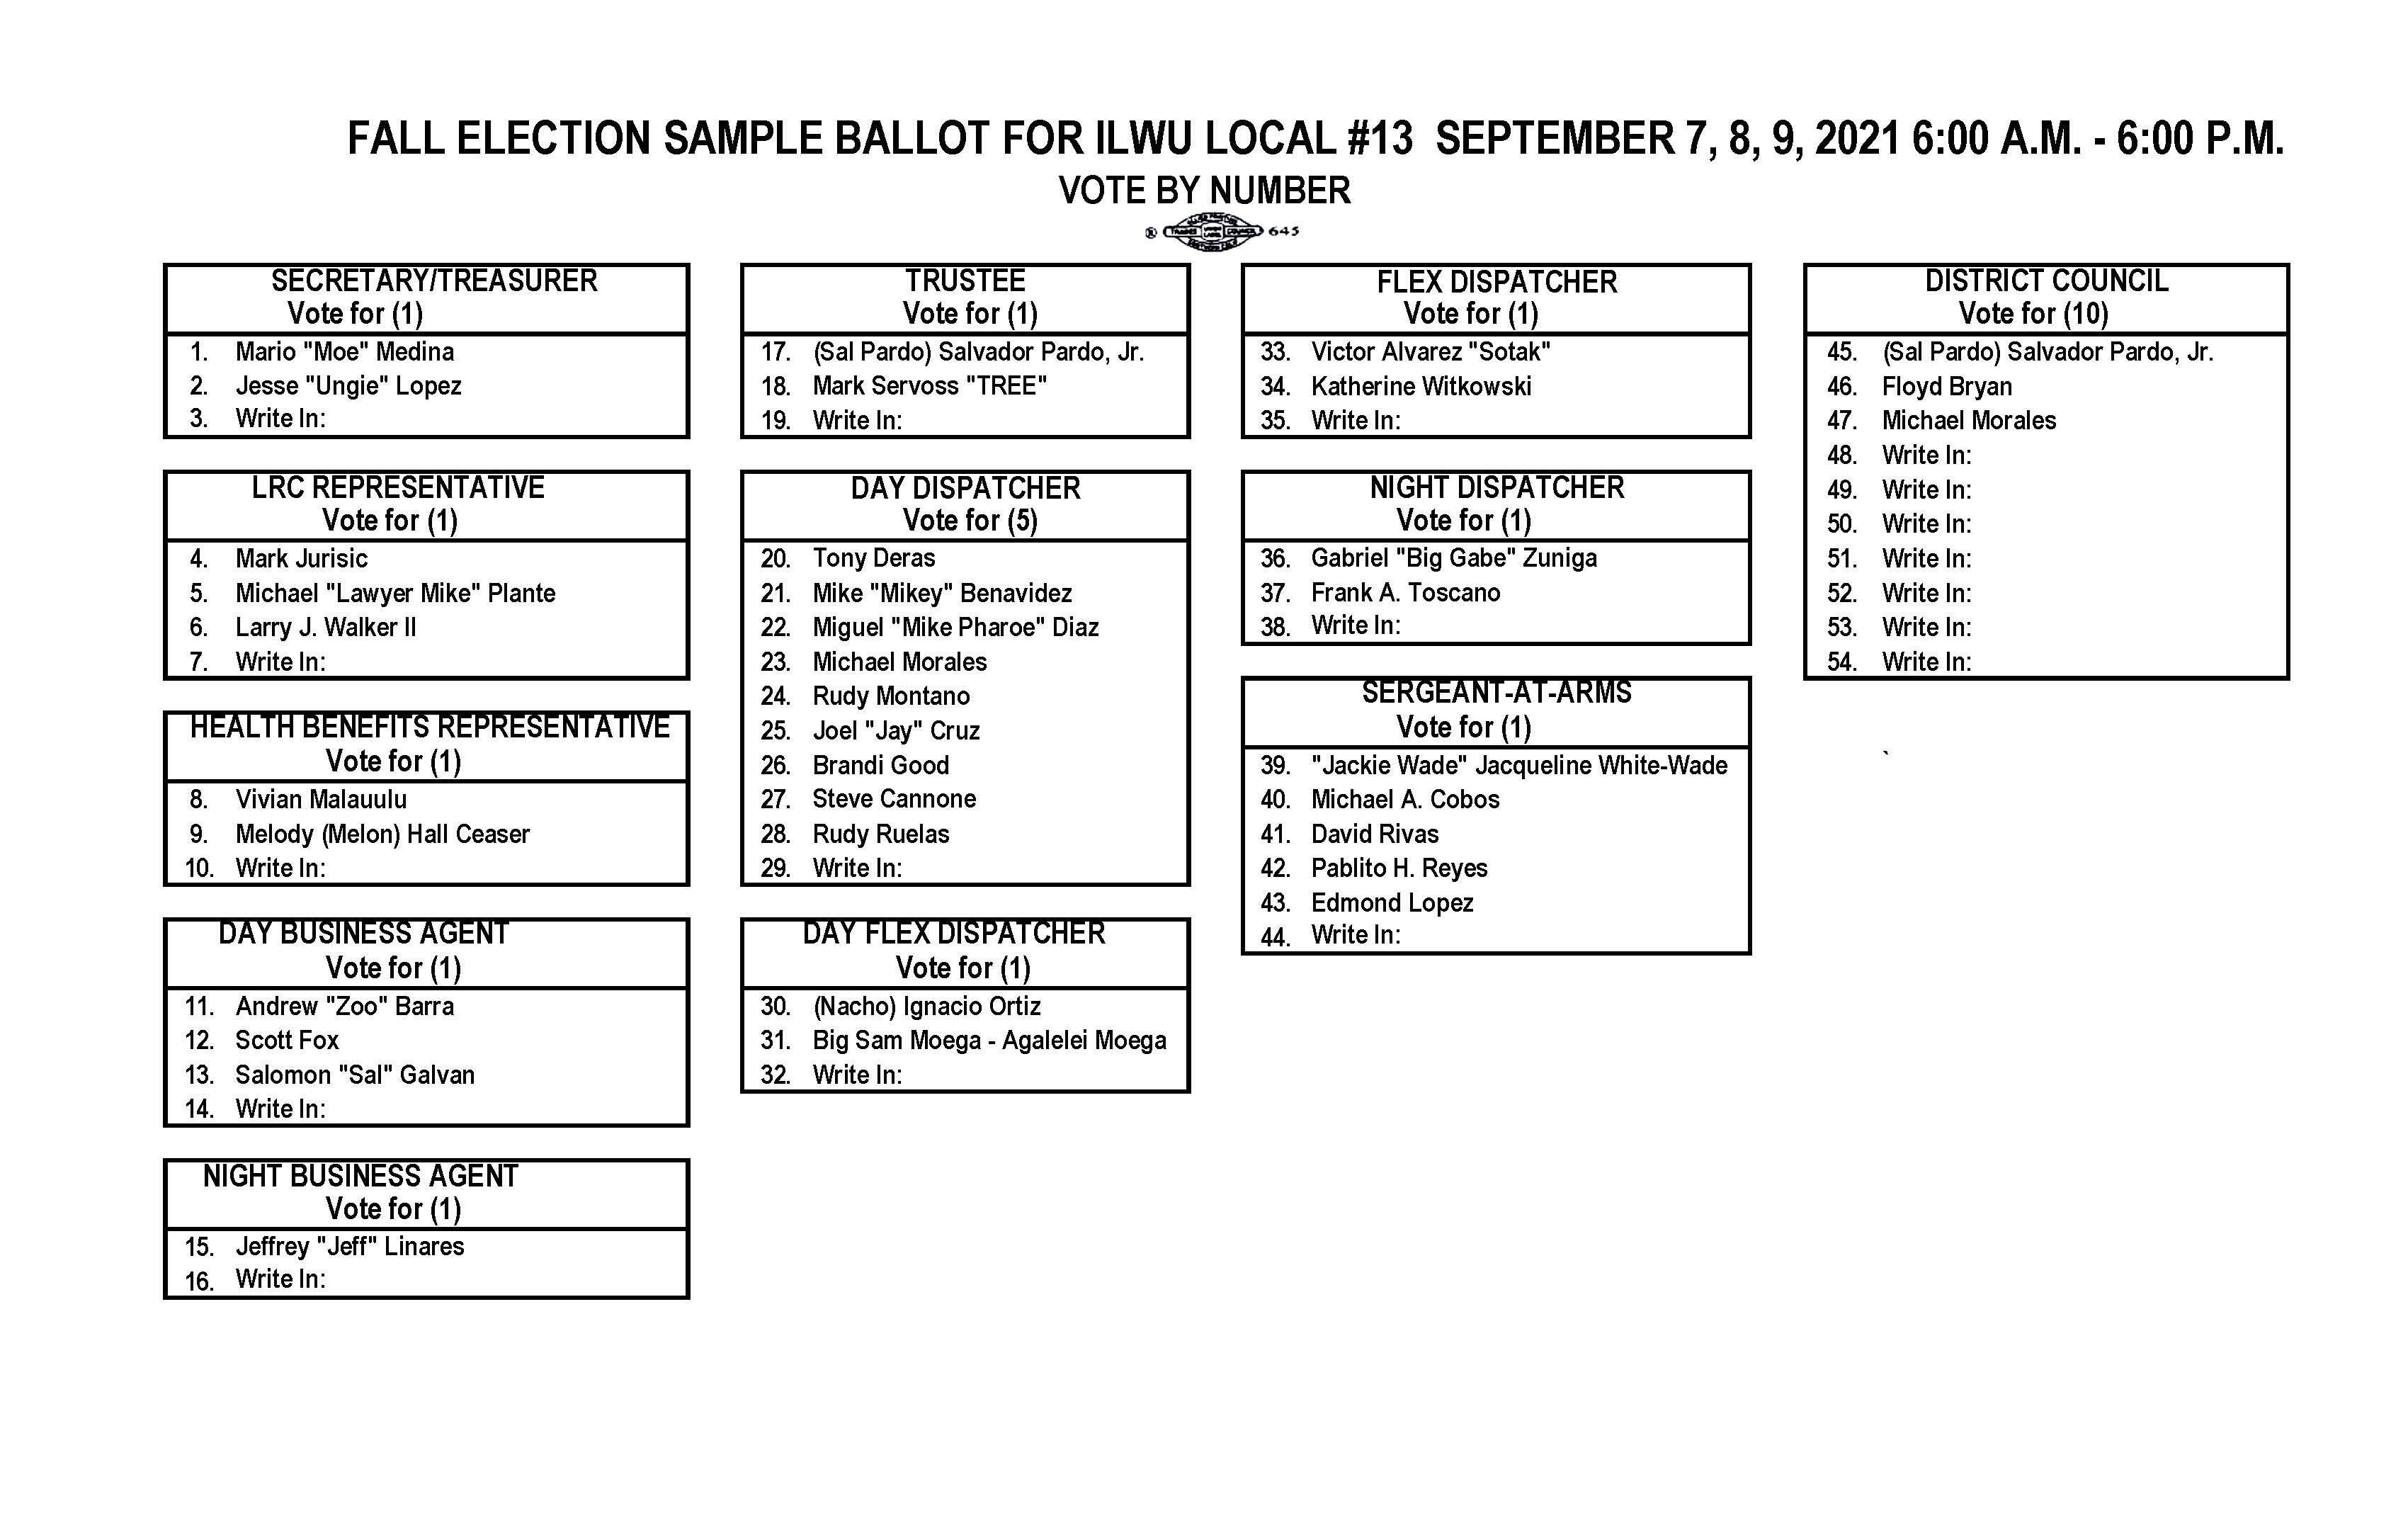 2021 Fall Election Ballot & Candidate Photos